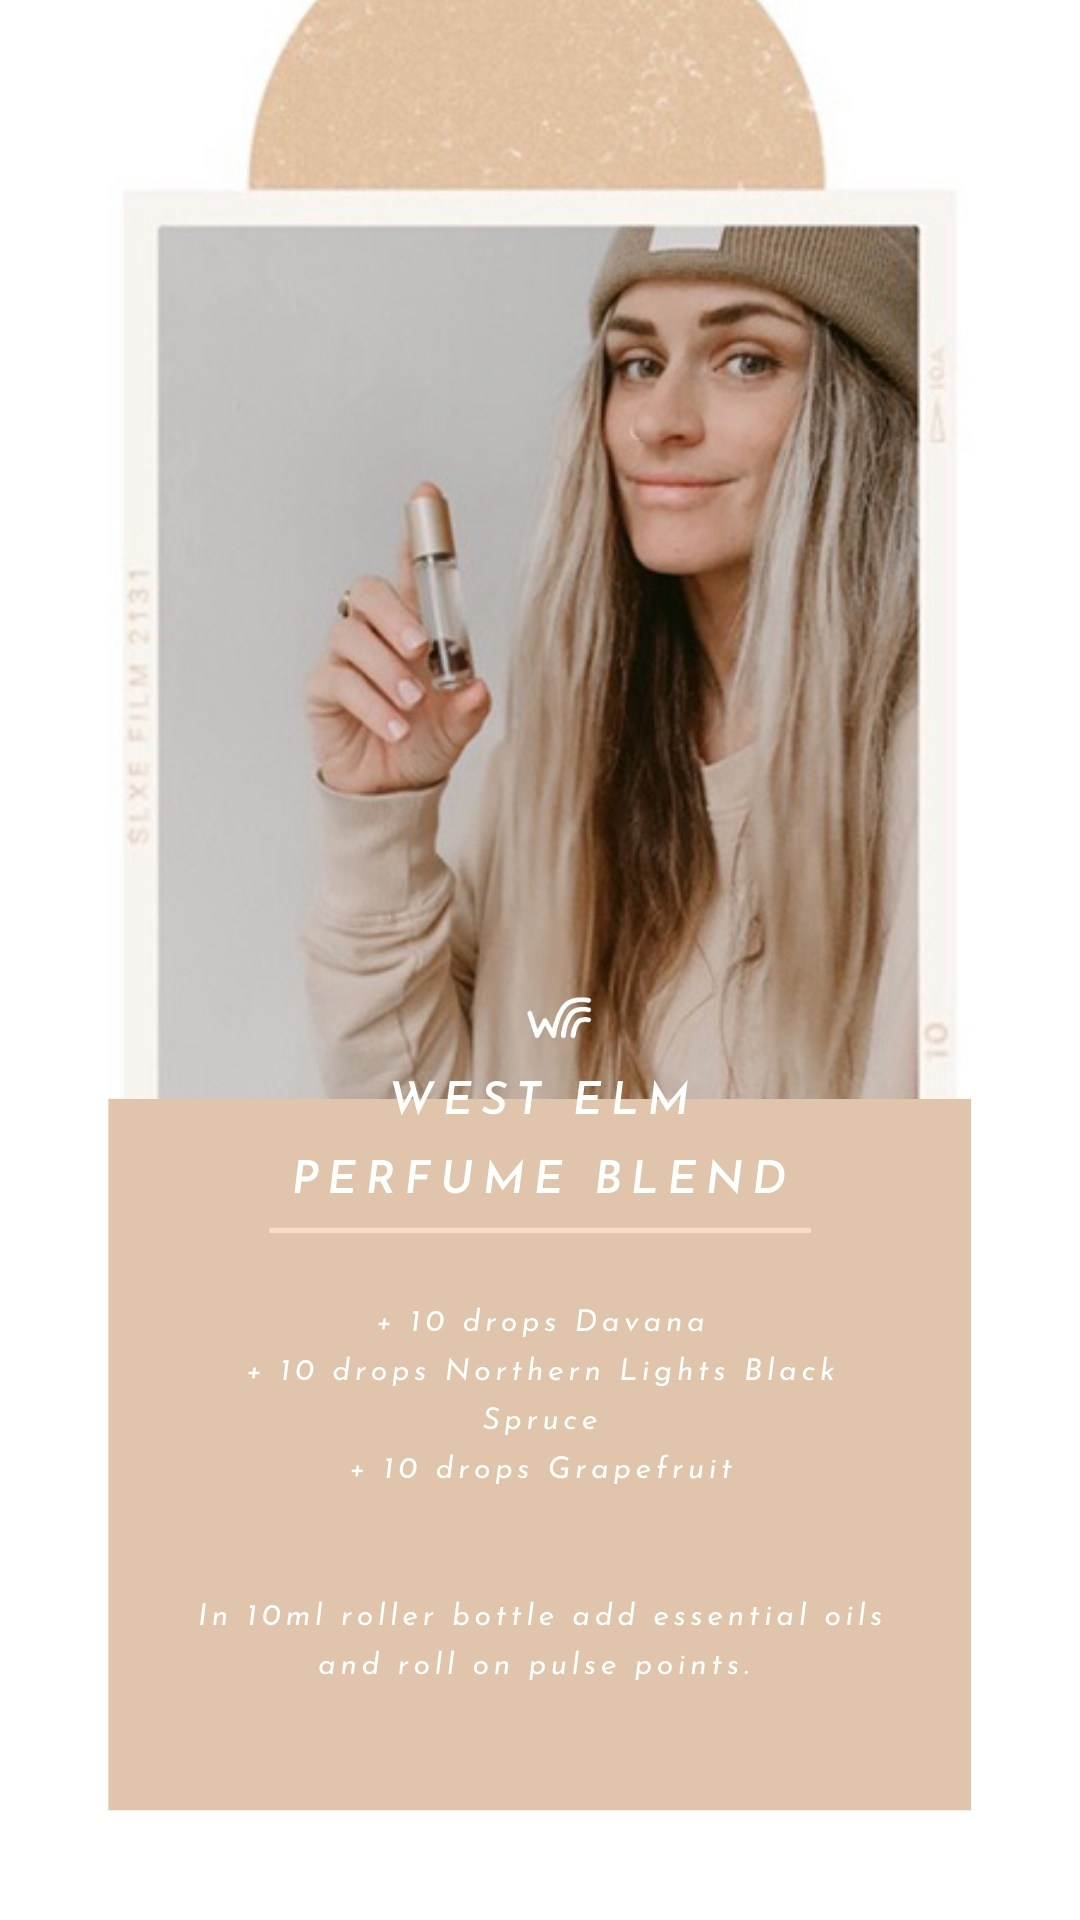 West Elm Perfume Essential Oil Blend For Crystal Roller Bottle Whimsy + Wellness